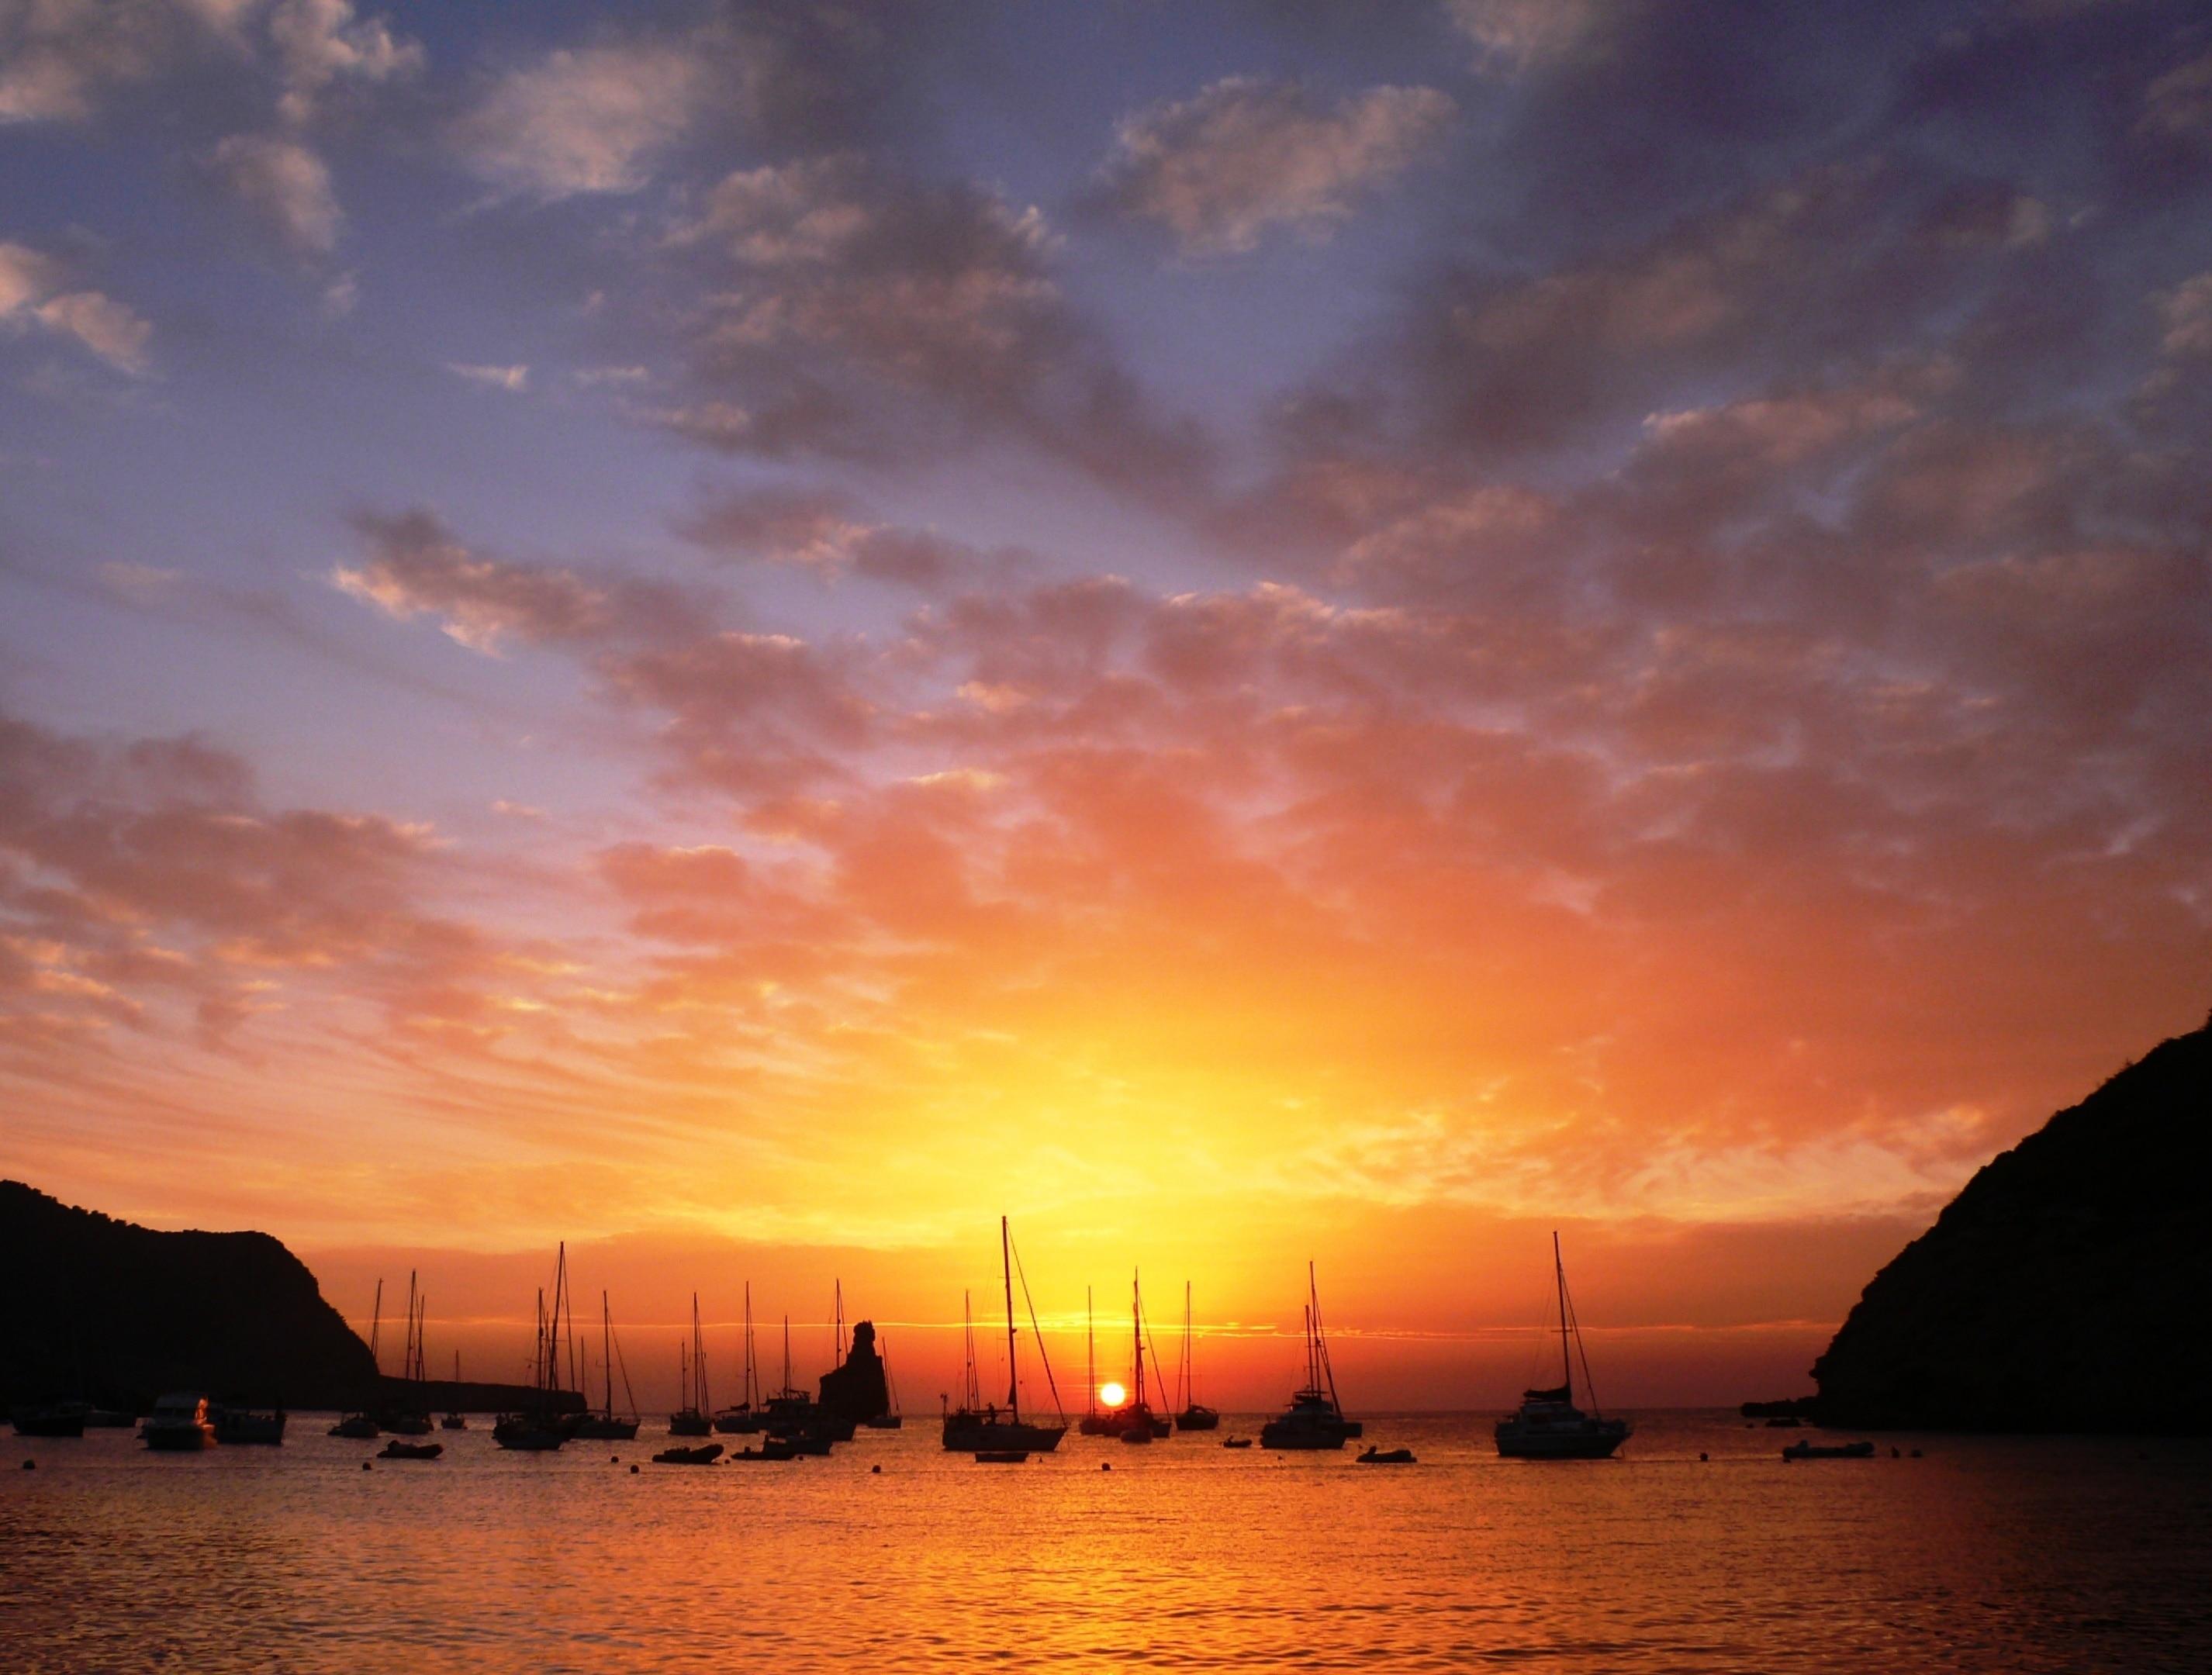 Cap Martinet, Santa Eulalia del Rio, Balearic Islands, Spain